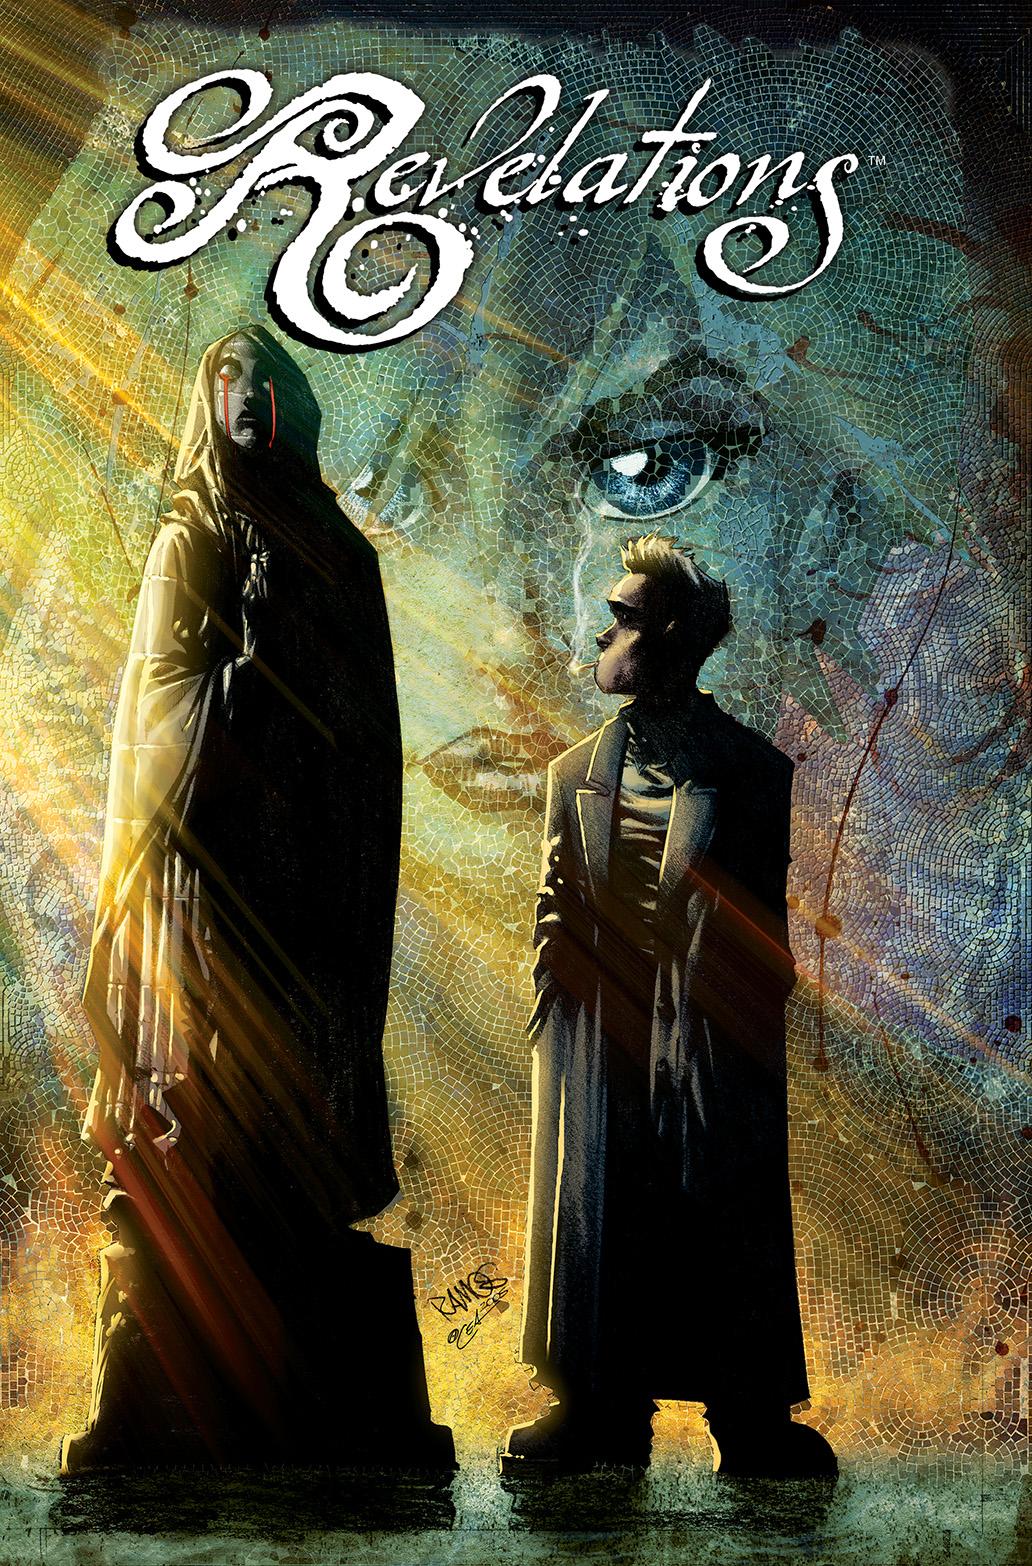 REVELATIONS #6 Cover by Humberto Ramos